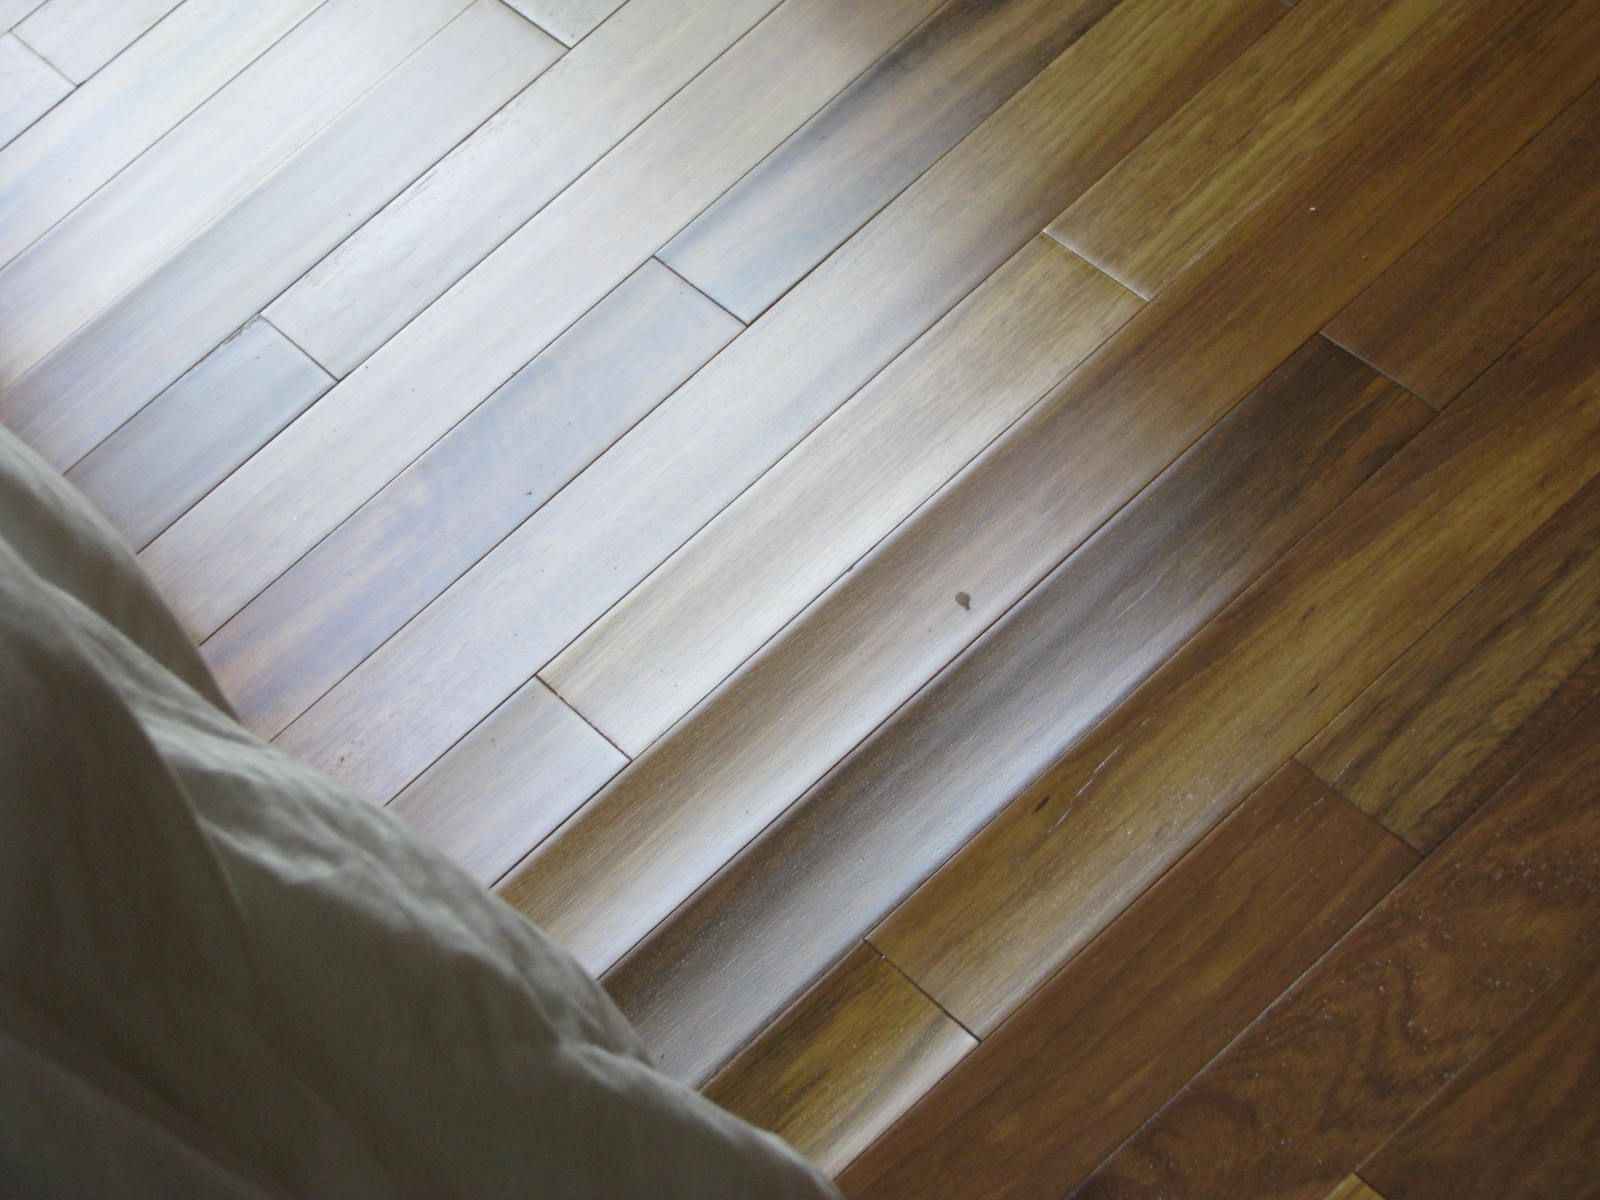 Water Damage To Hardwood Floors Cupping